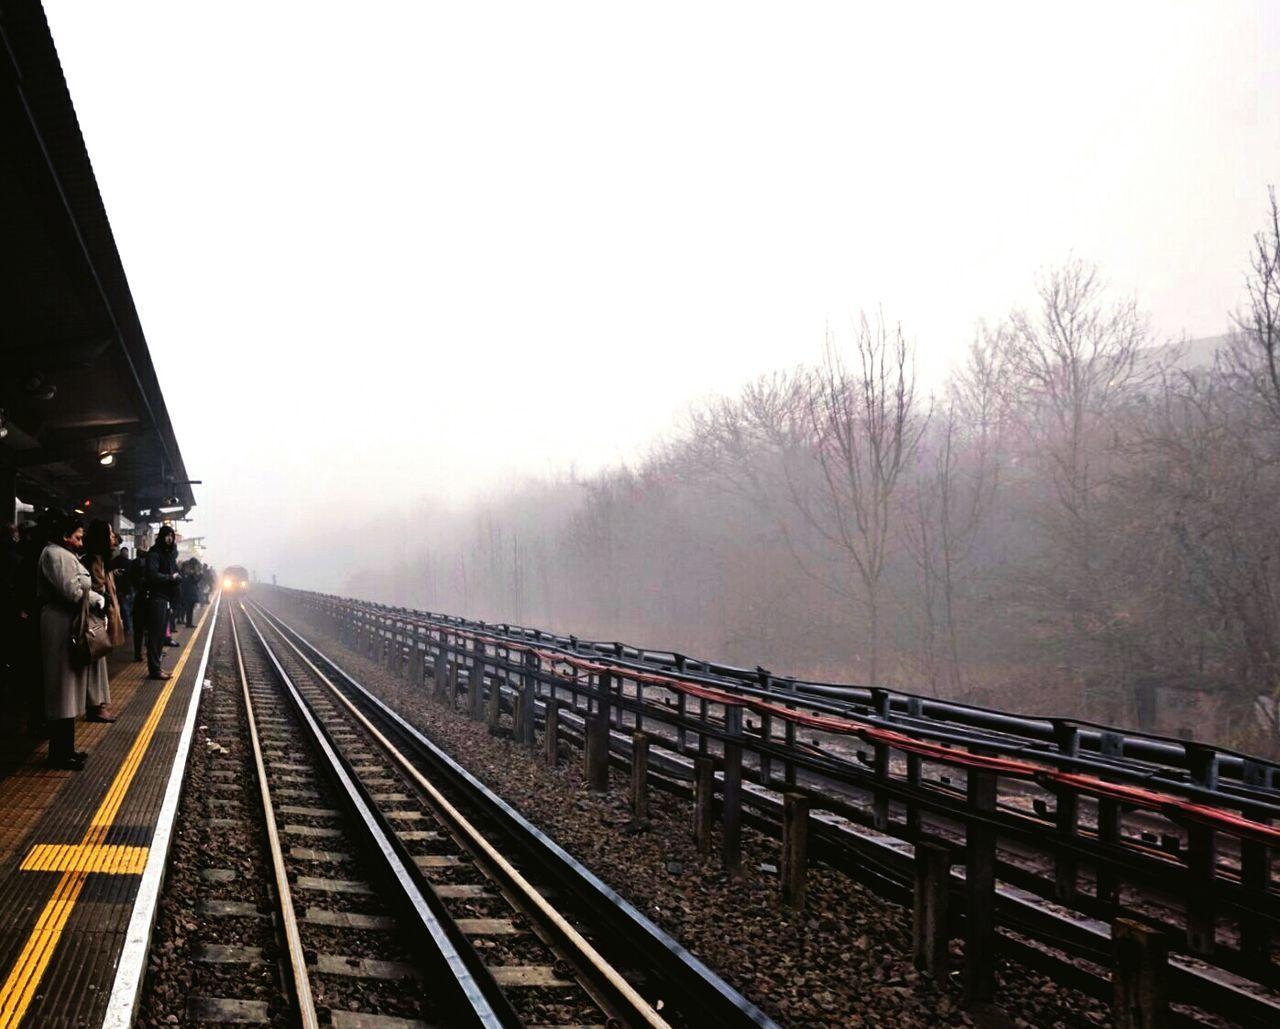 transportation, railroad track, rail transportation, public transportation, fog, mode of transport, outdoors, day, no people, sky, nature, tree